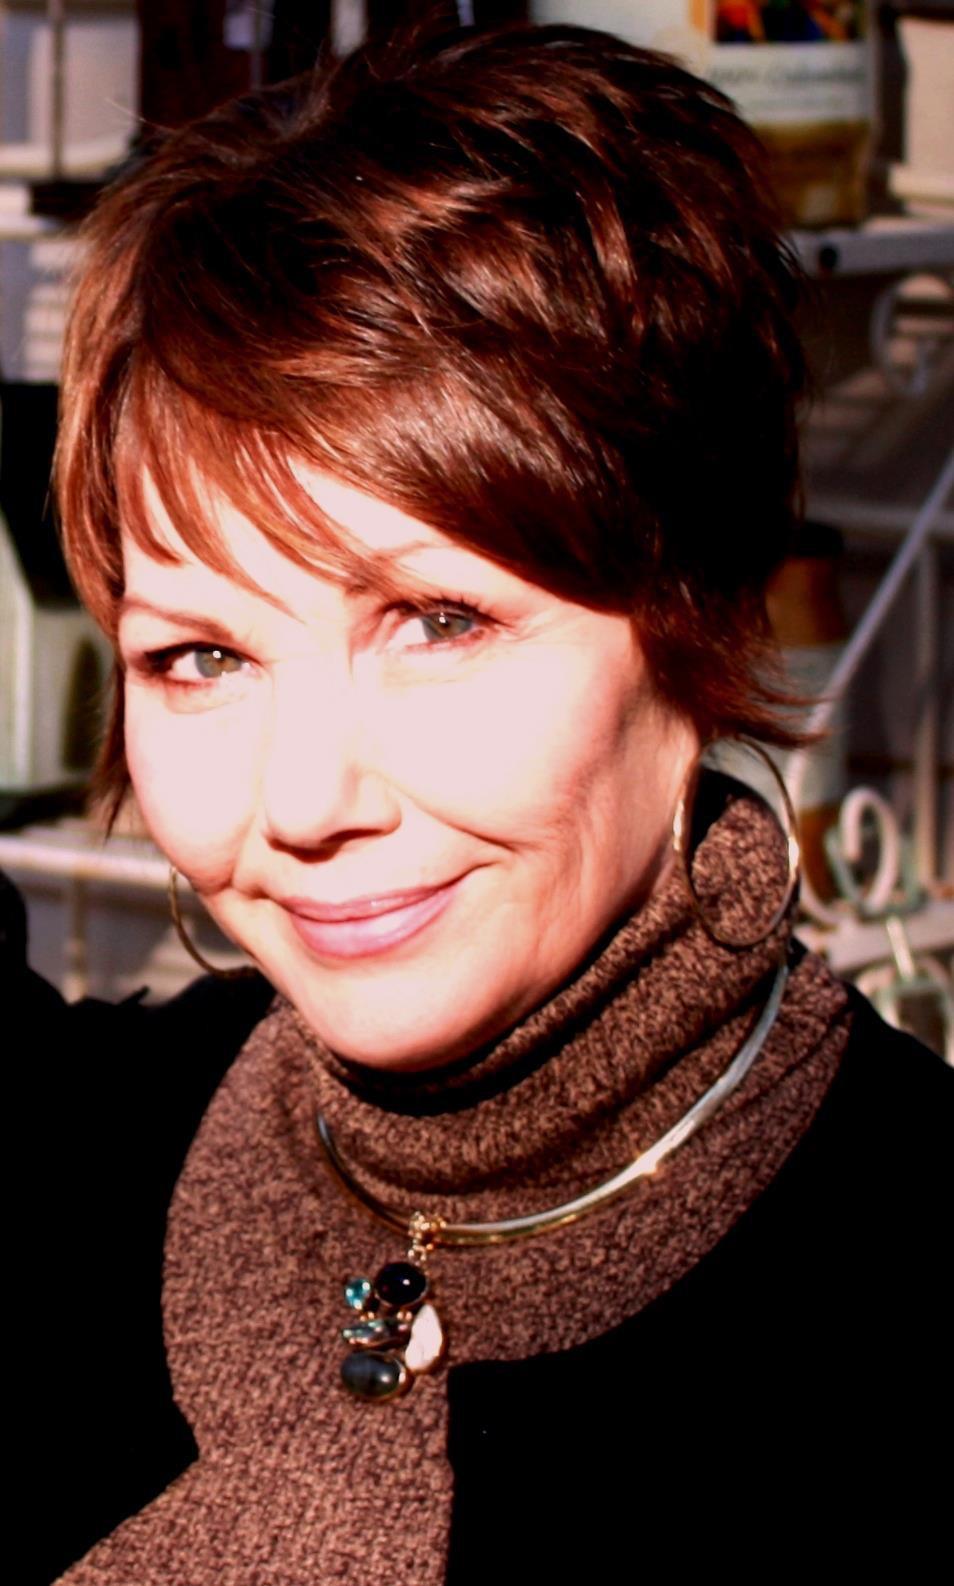 Tisha Campbell-Martin,Rene Bond Adult archive Paul Merton (born 1957),Carly Chaikin